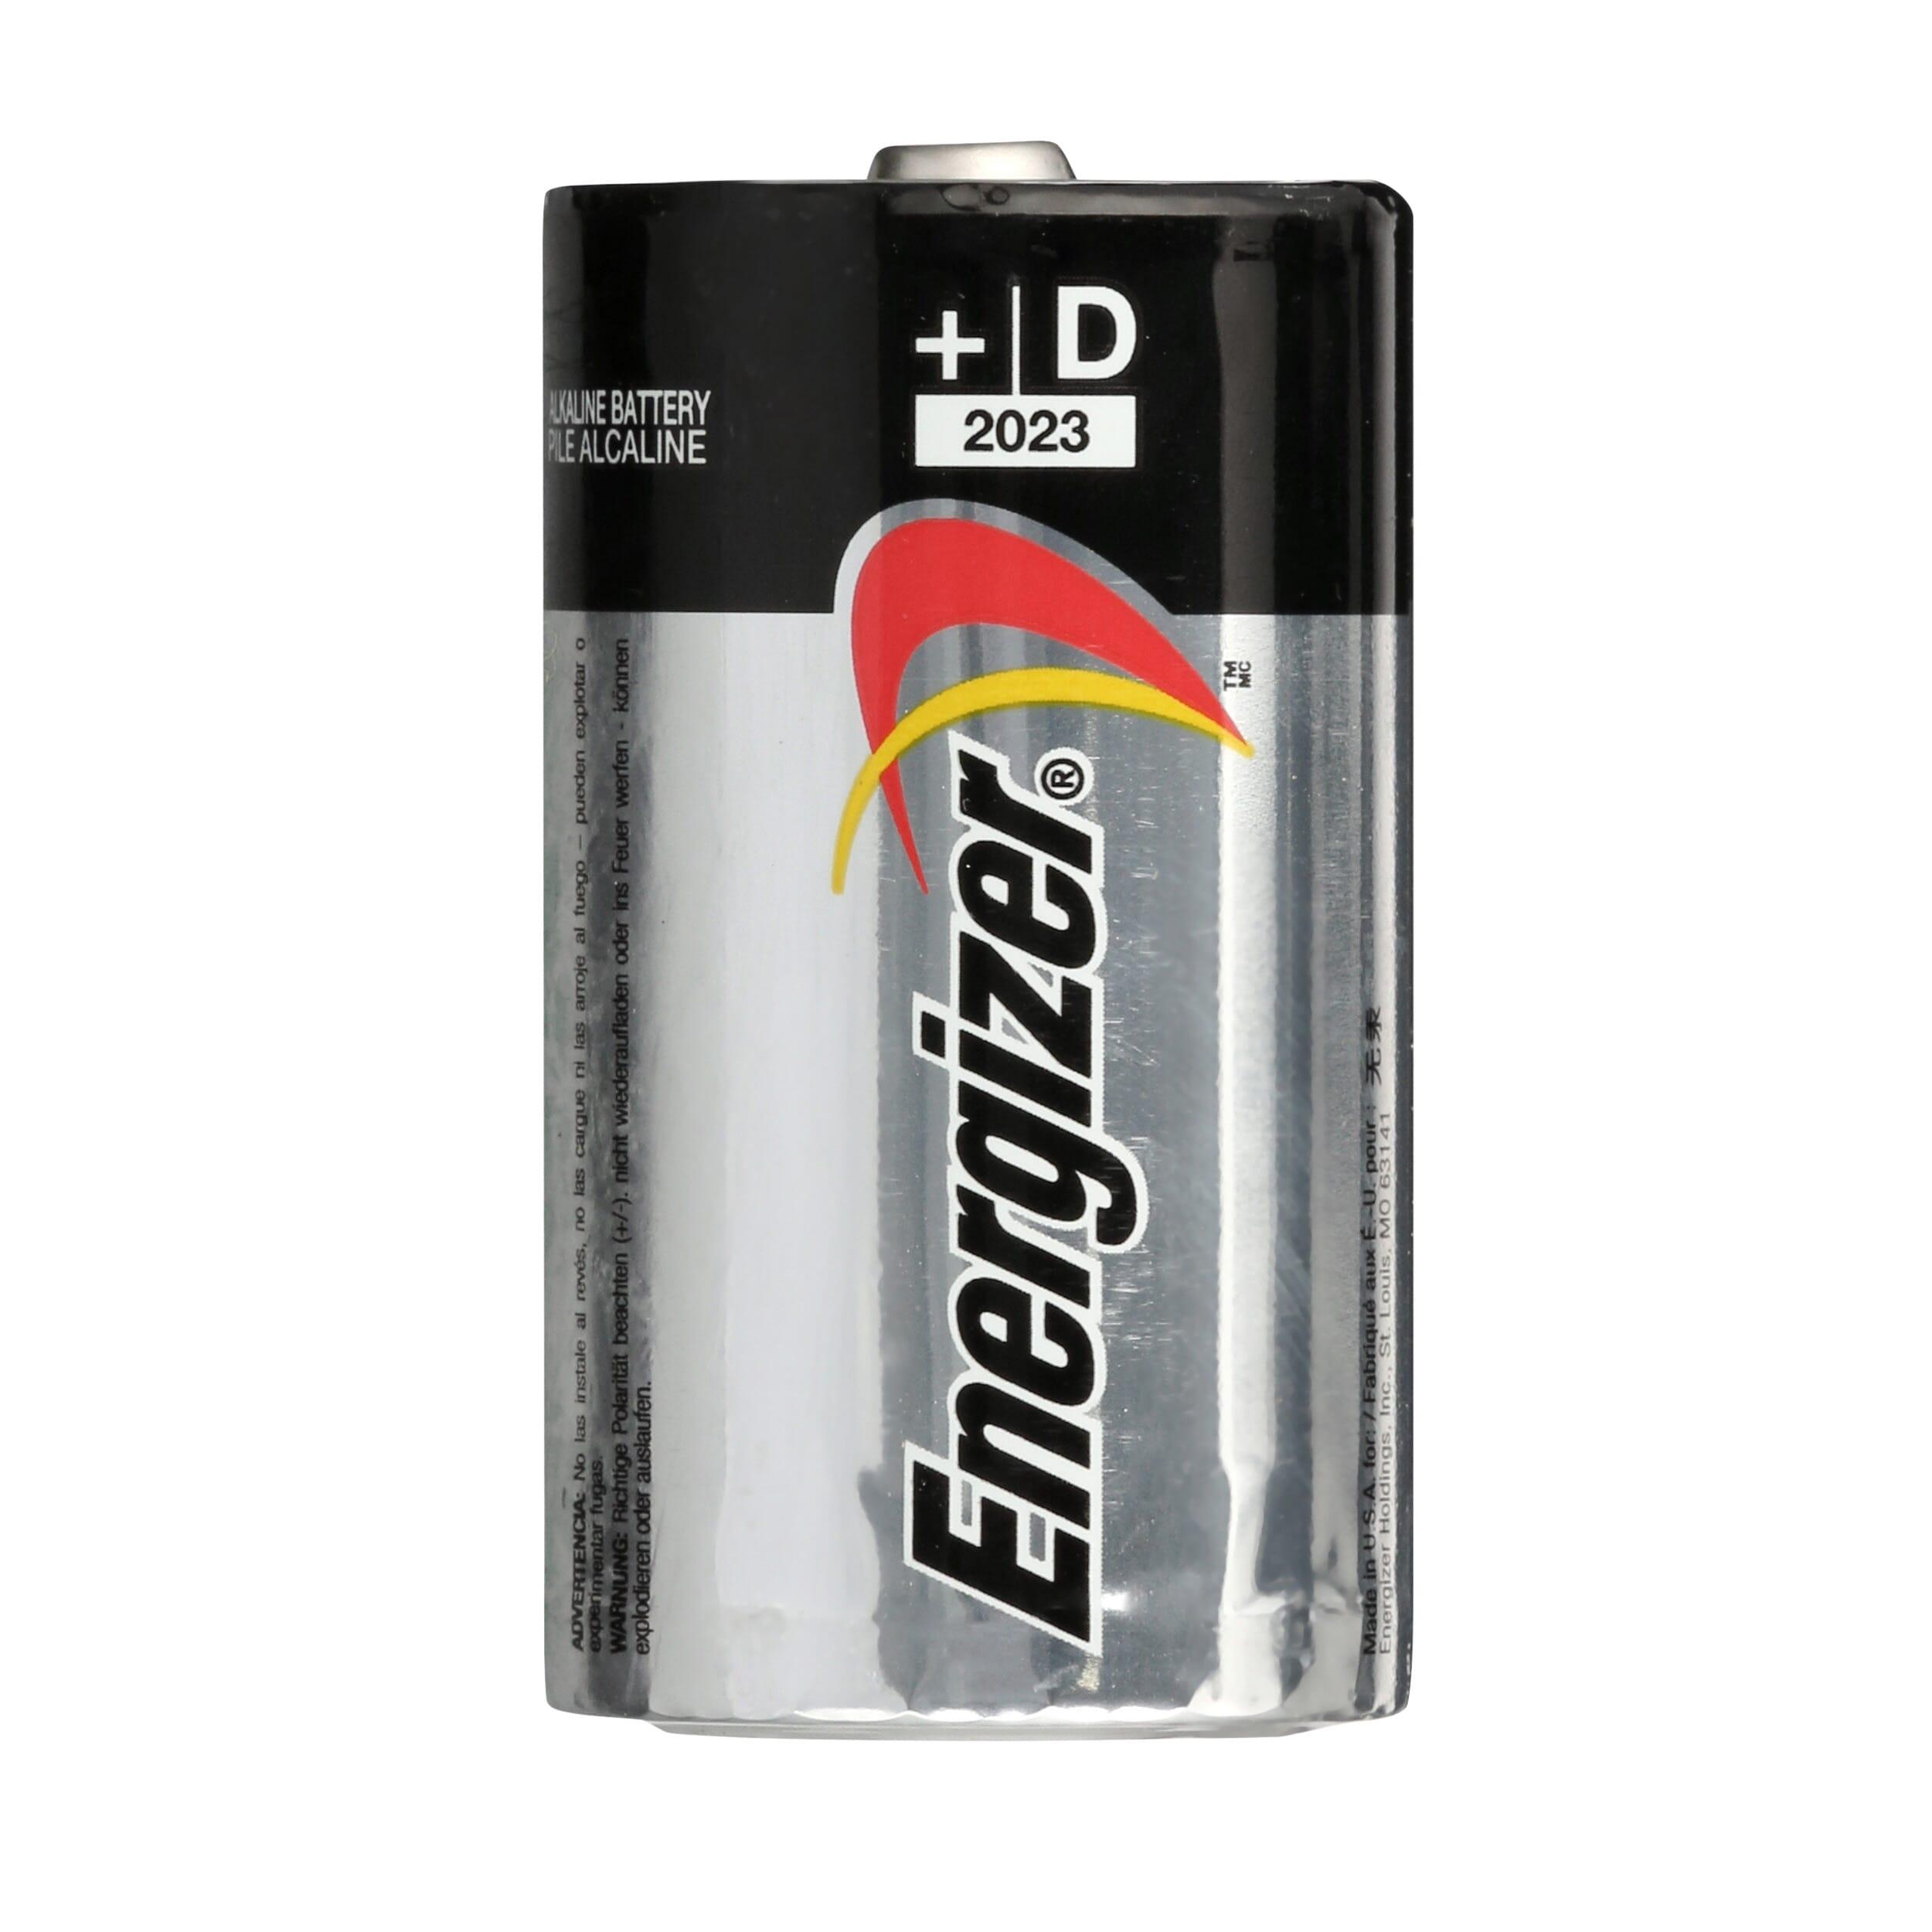 Energizer MAX Alkaline D Battery (4-Pack)-E95SBP4T1 - The Home Depot